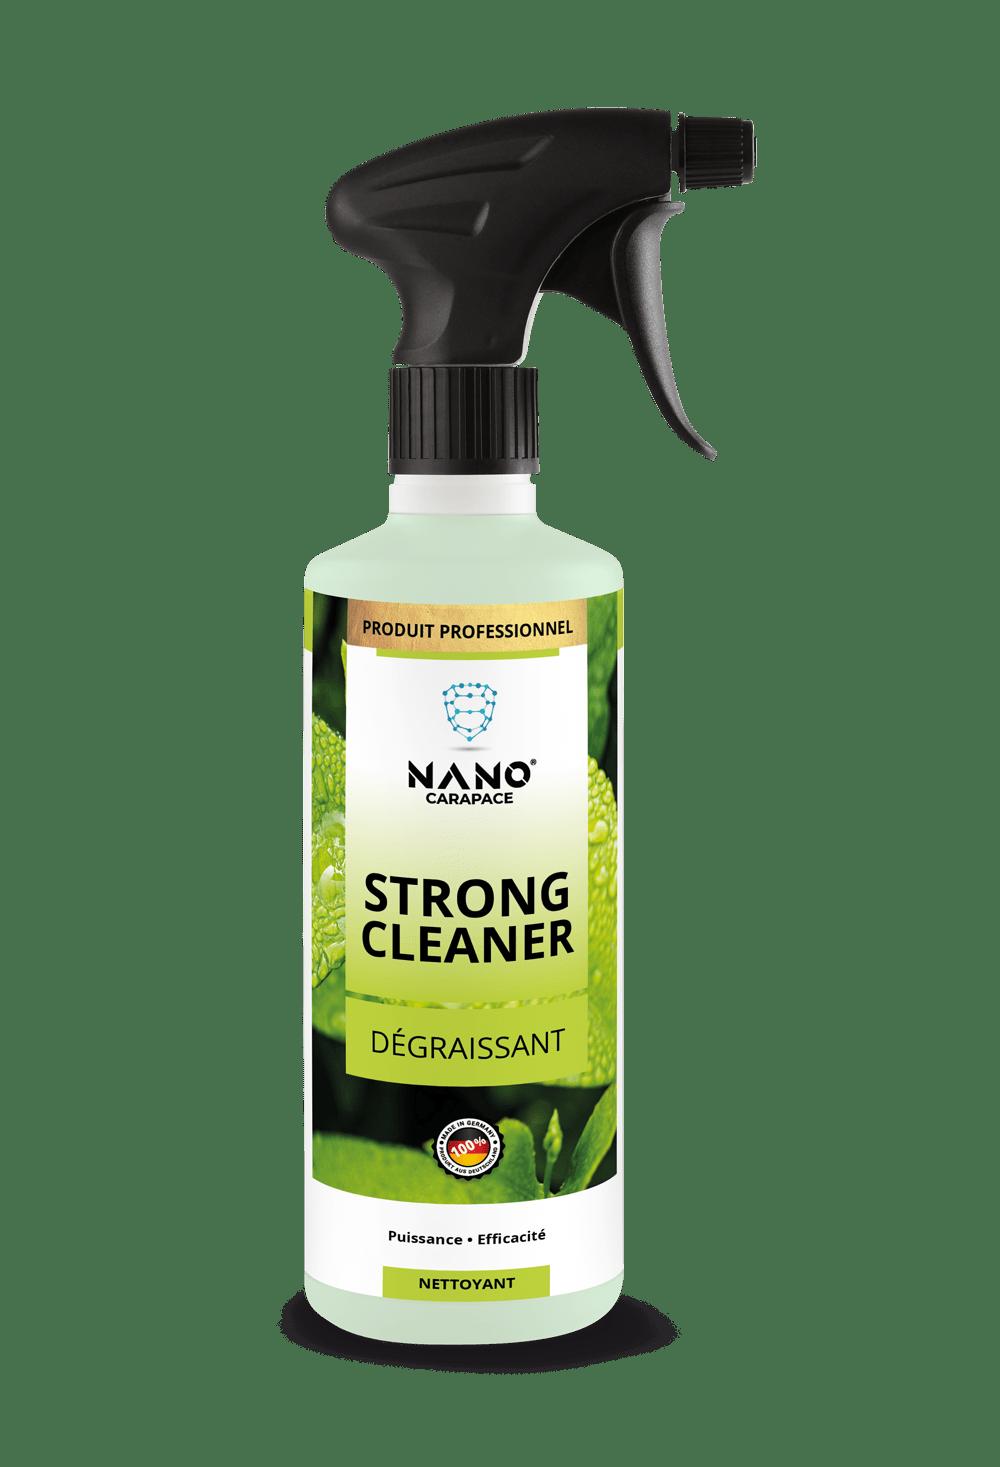 Dégraissant Carrosserie - Strong Cleaner